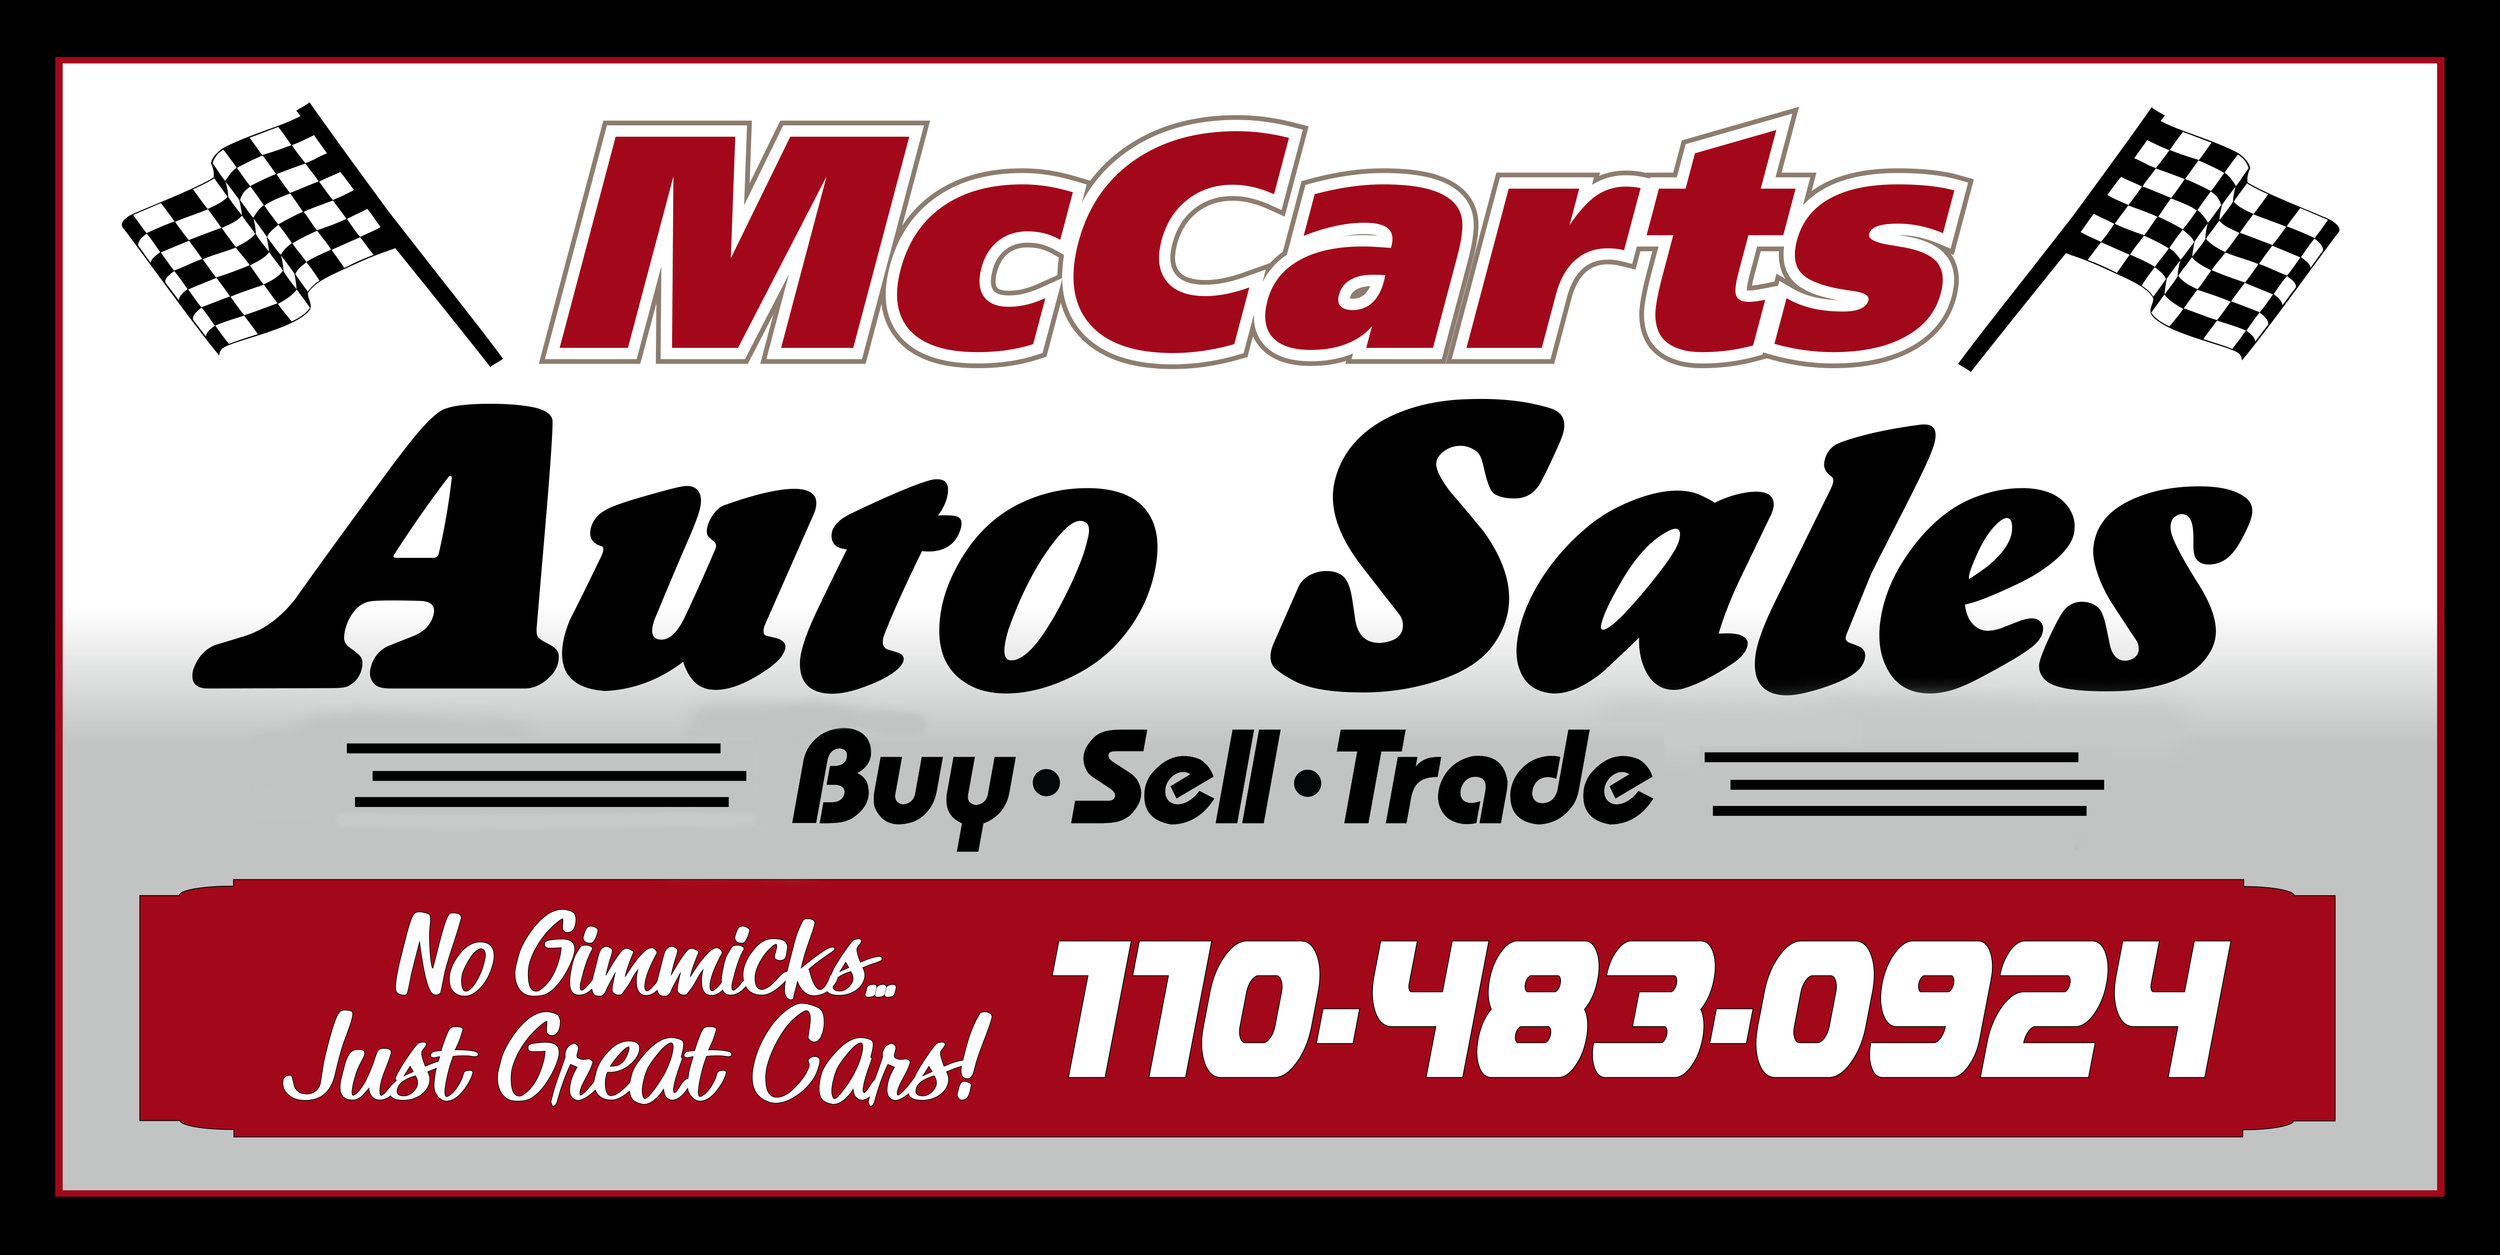 Click the logo to visit McCarts Auto Sales